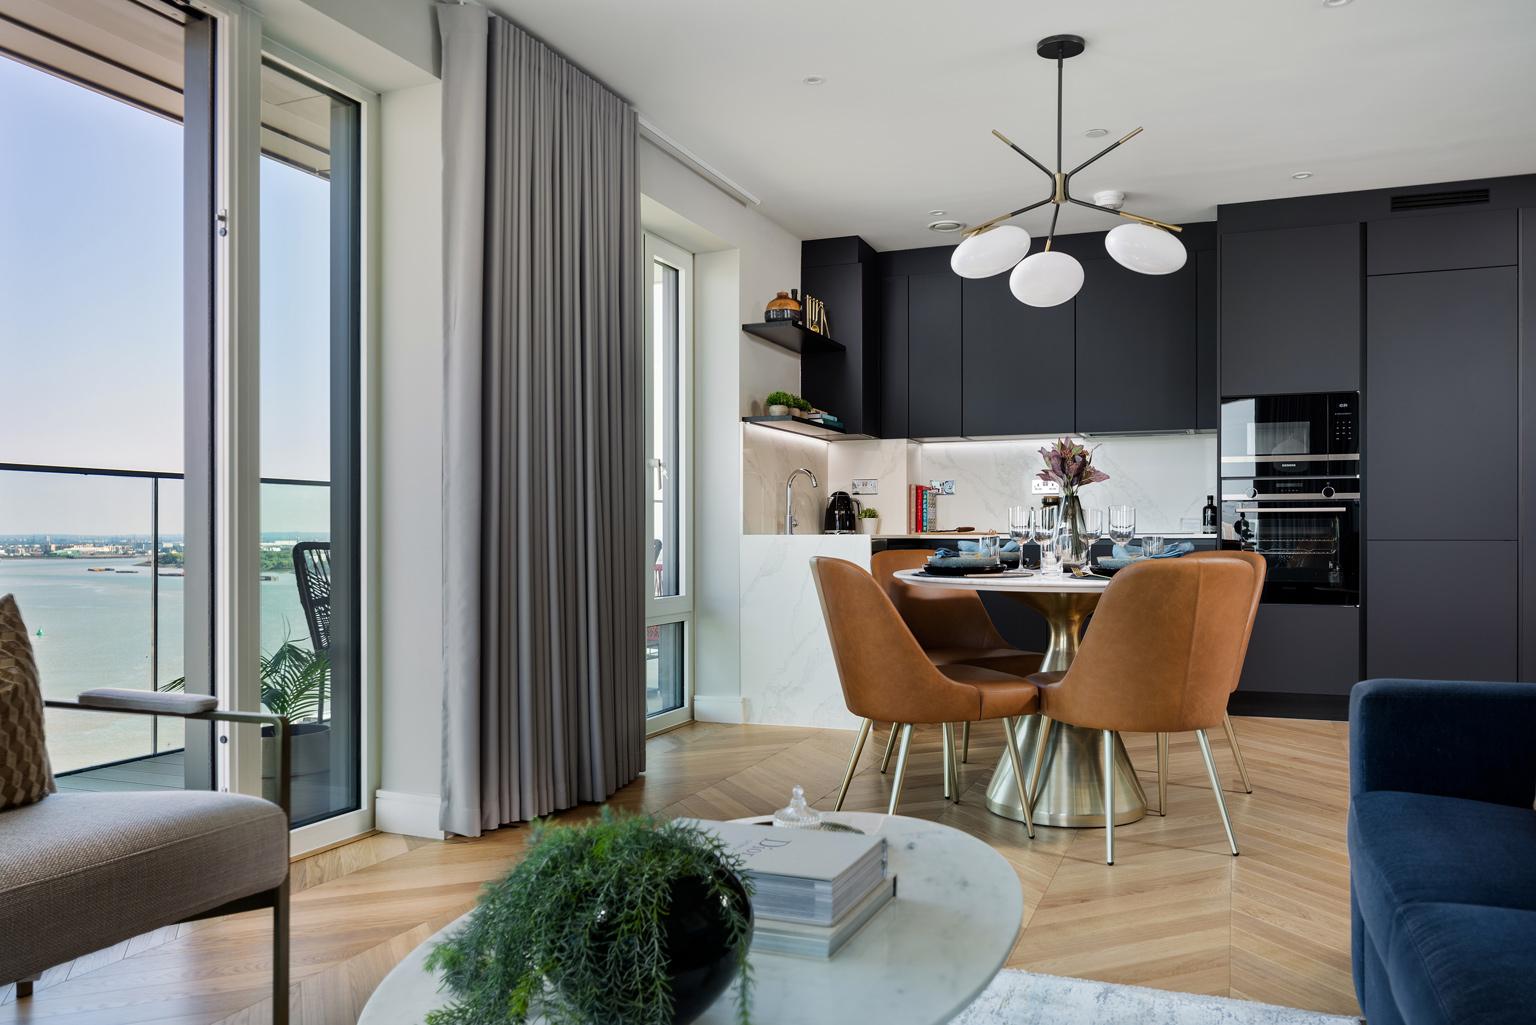 Berkeley Homes - Royal Arsenal Riverside - Norton House